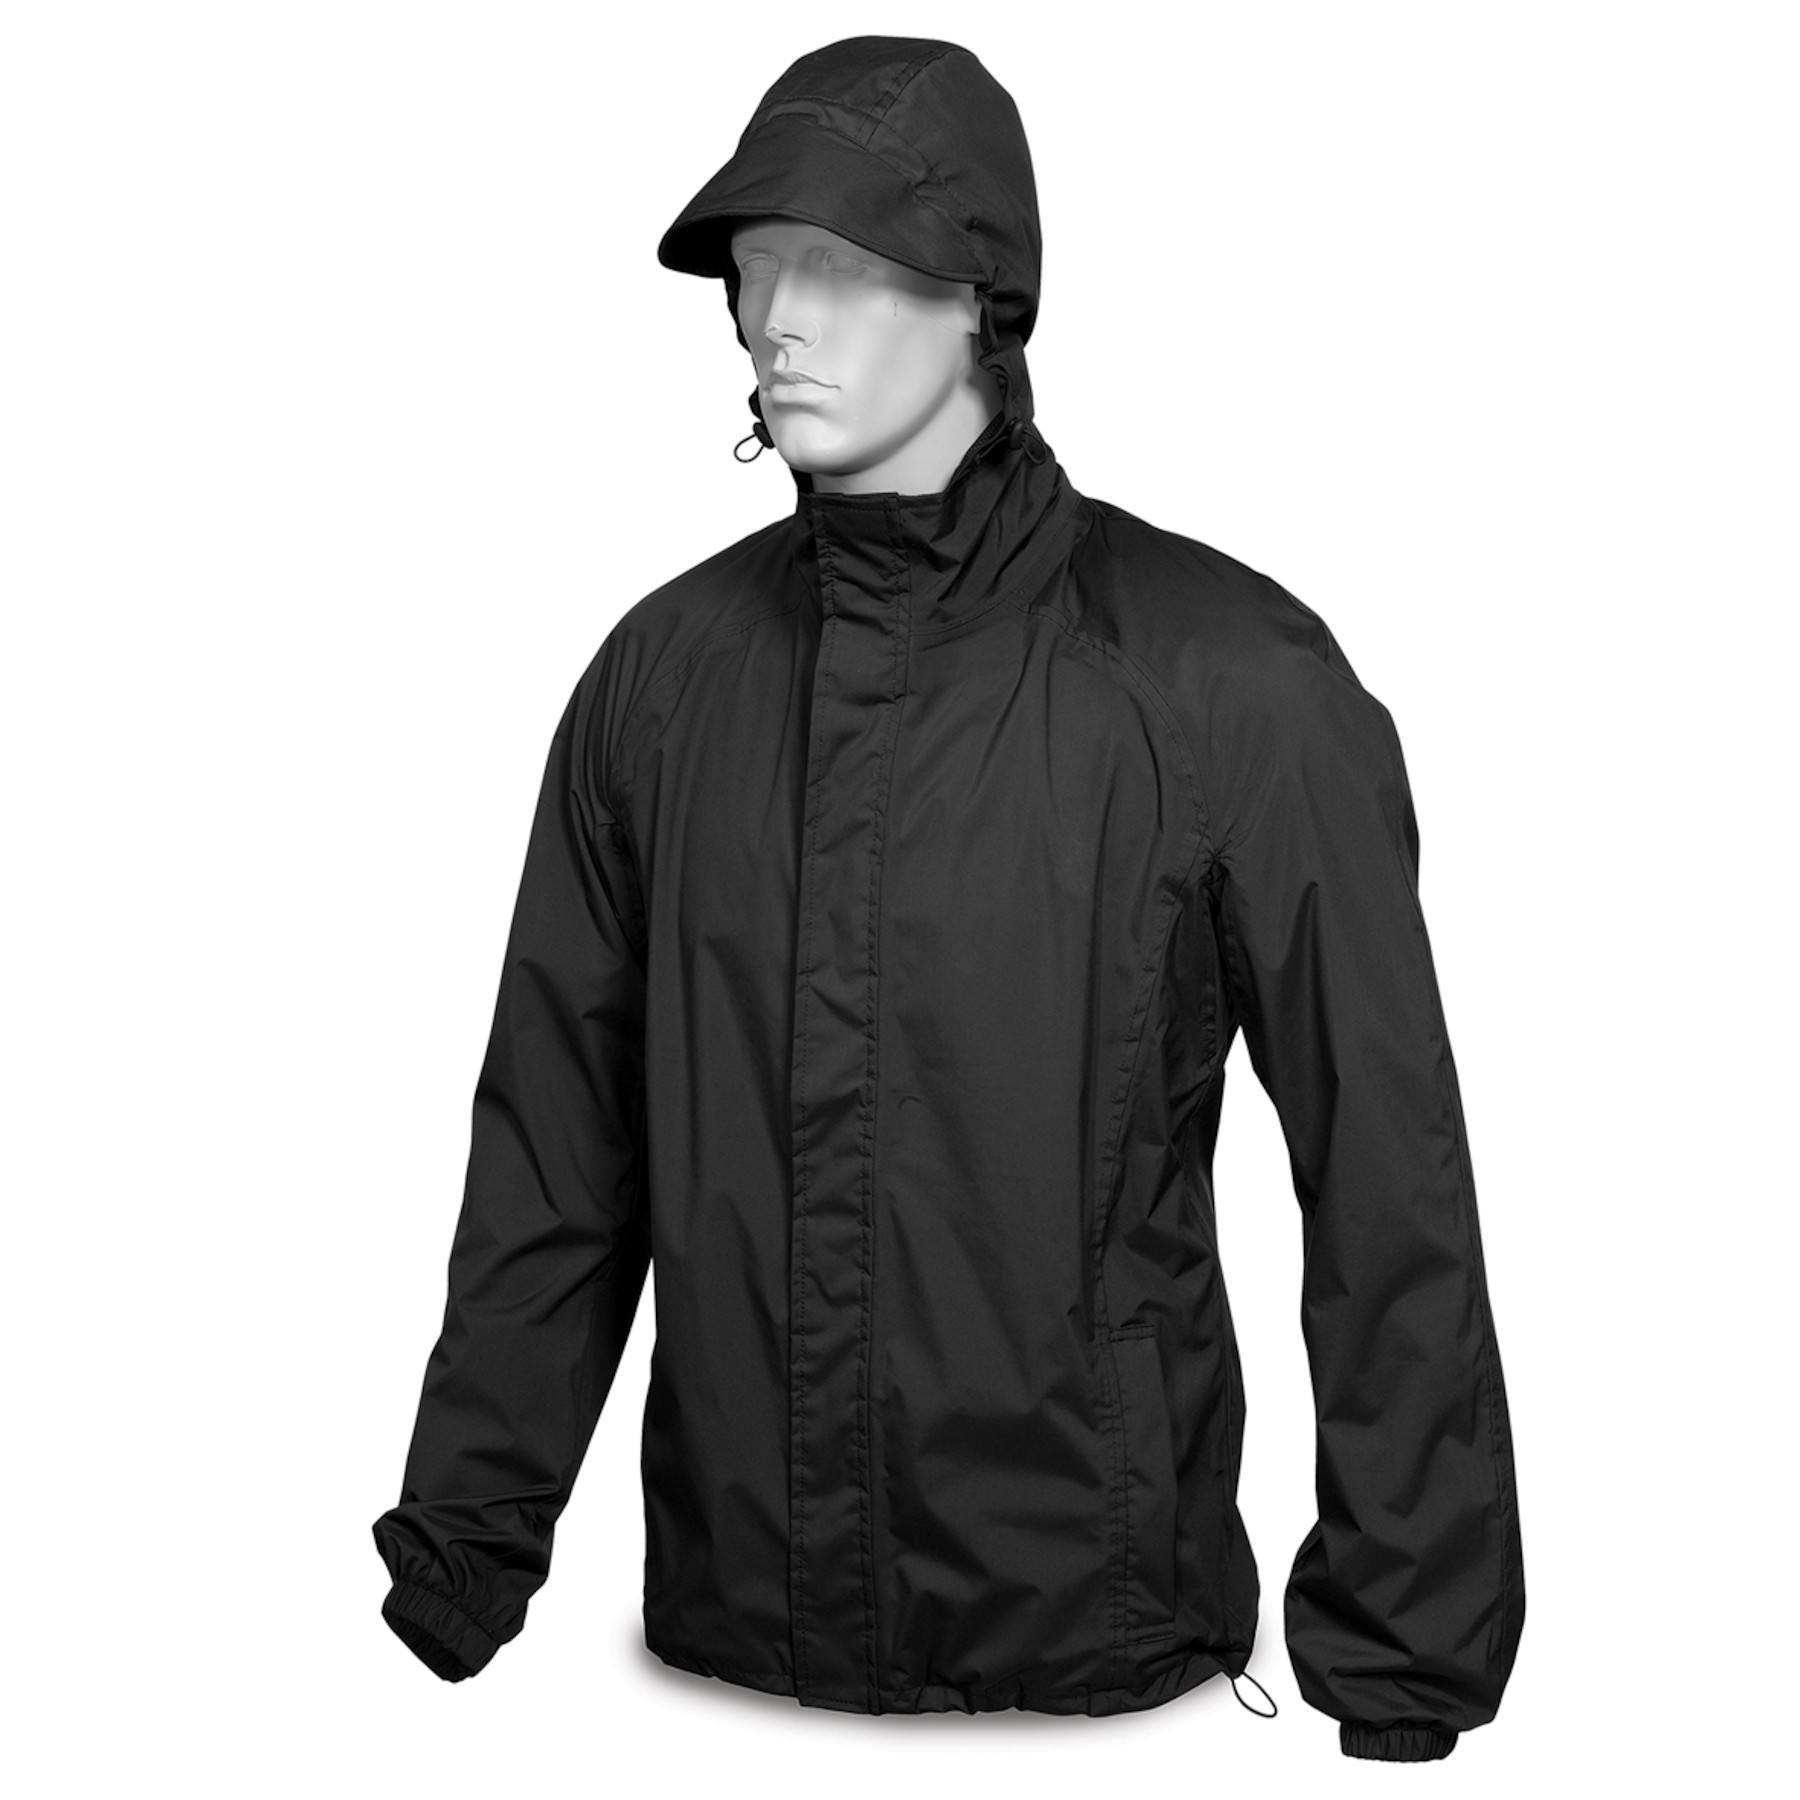 Pro Air giacca uomo M